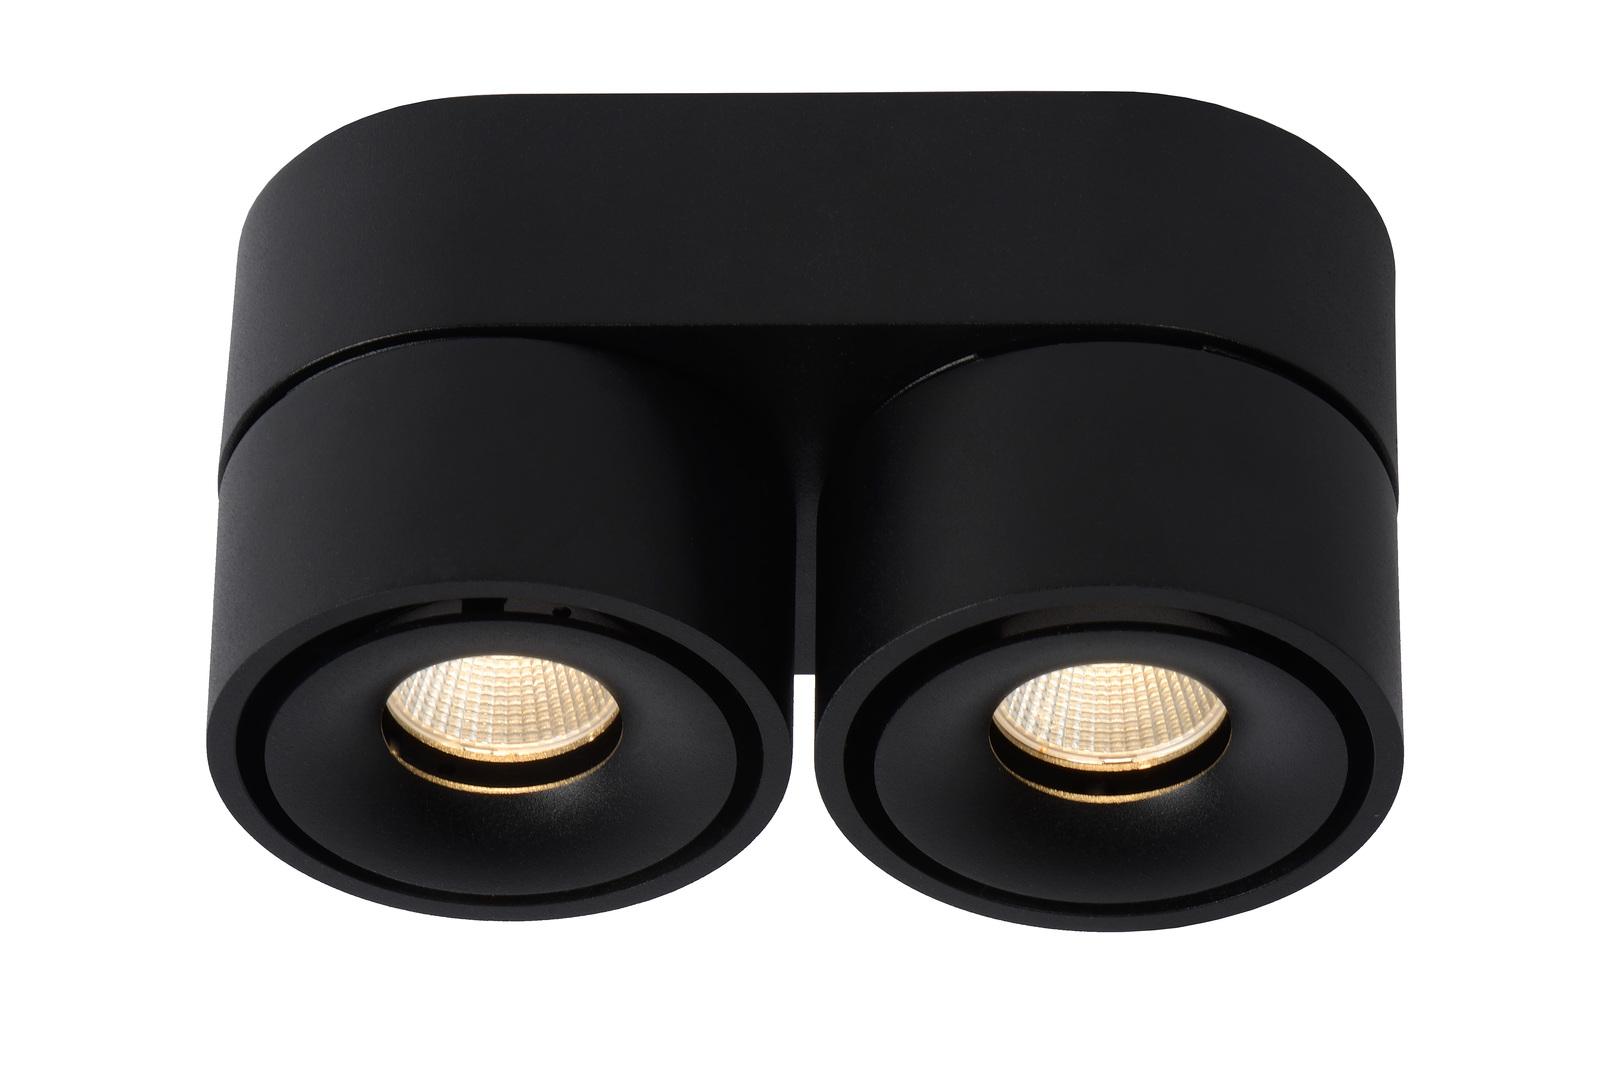 Deckenstrahler Spot MIKO schwarz LED